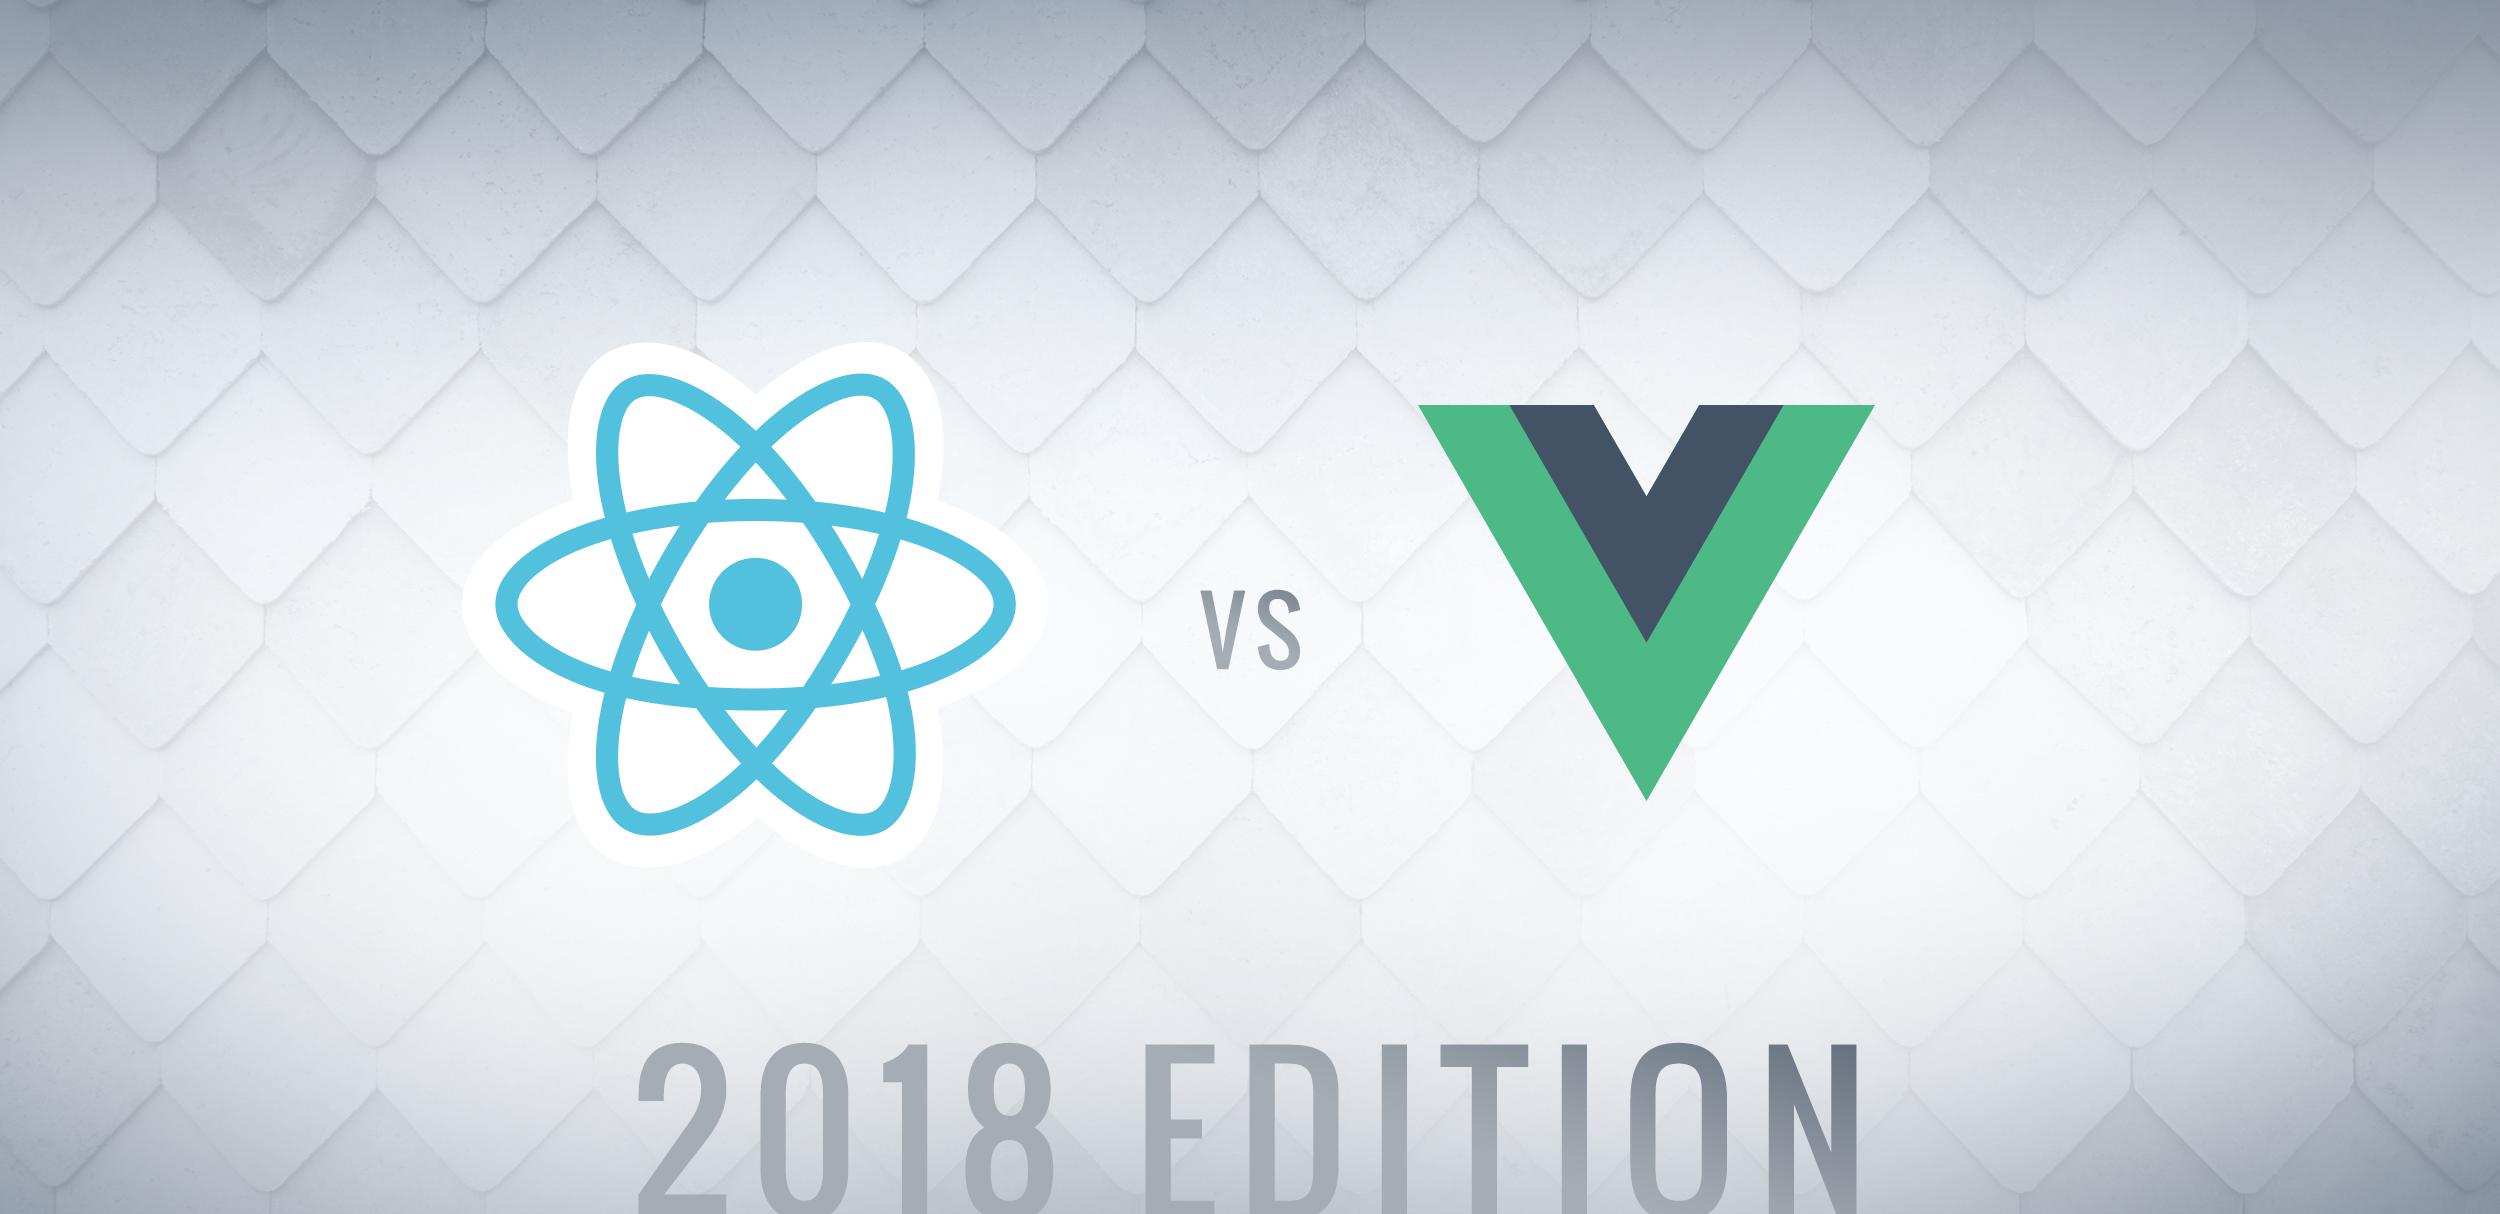 Vue vs React: 2018 Edition